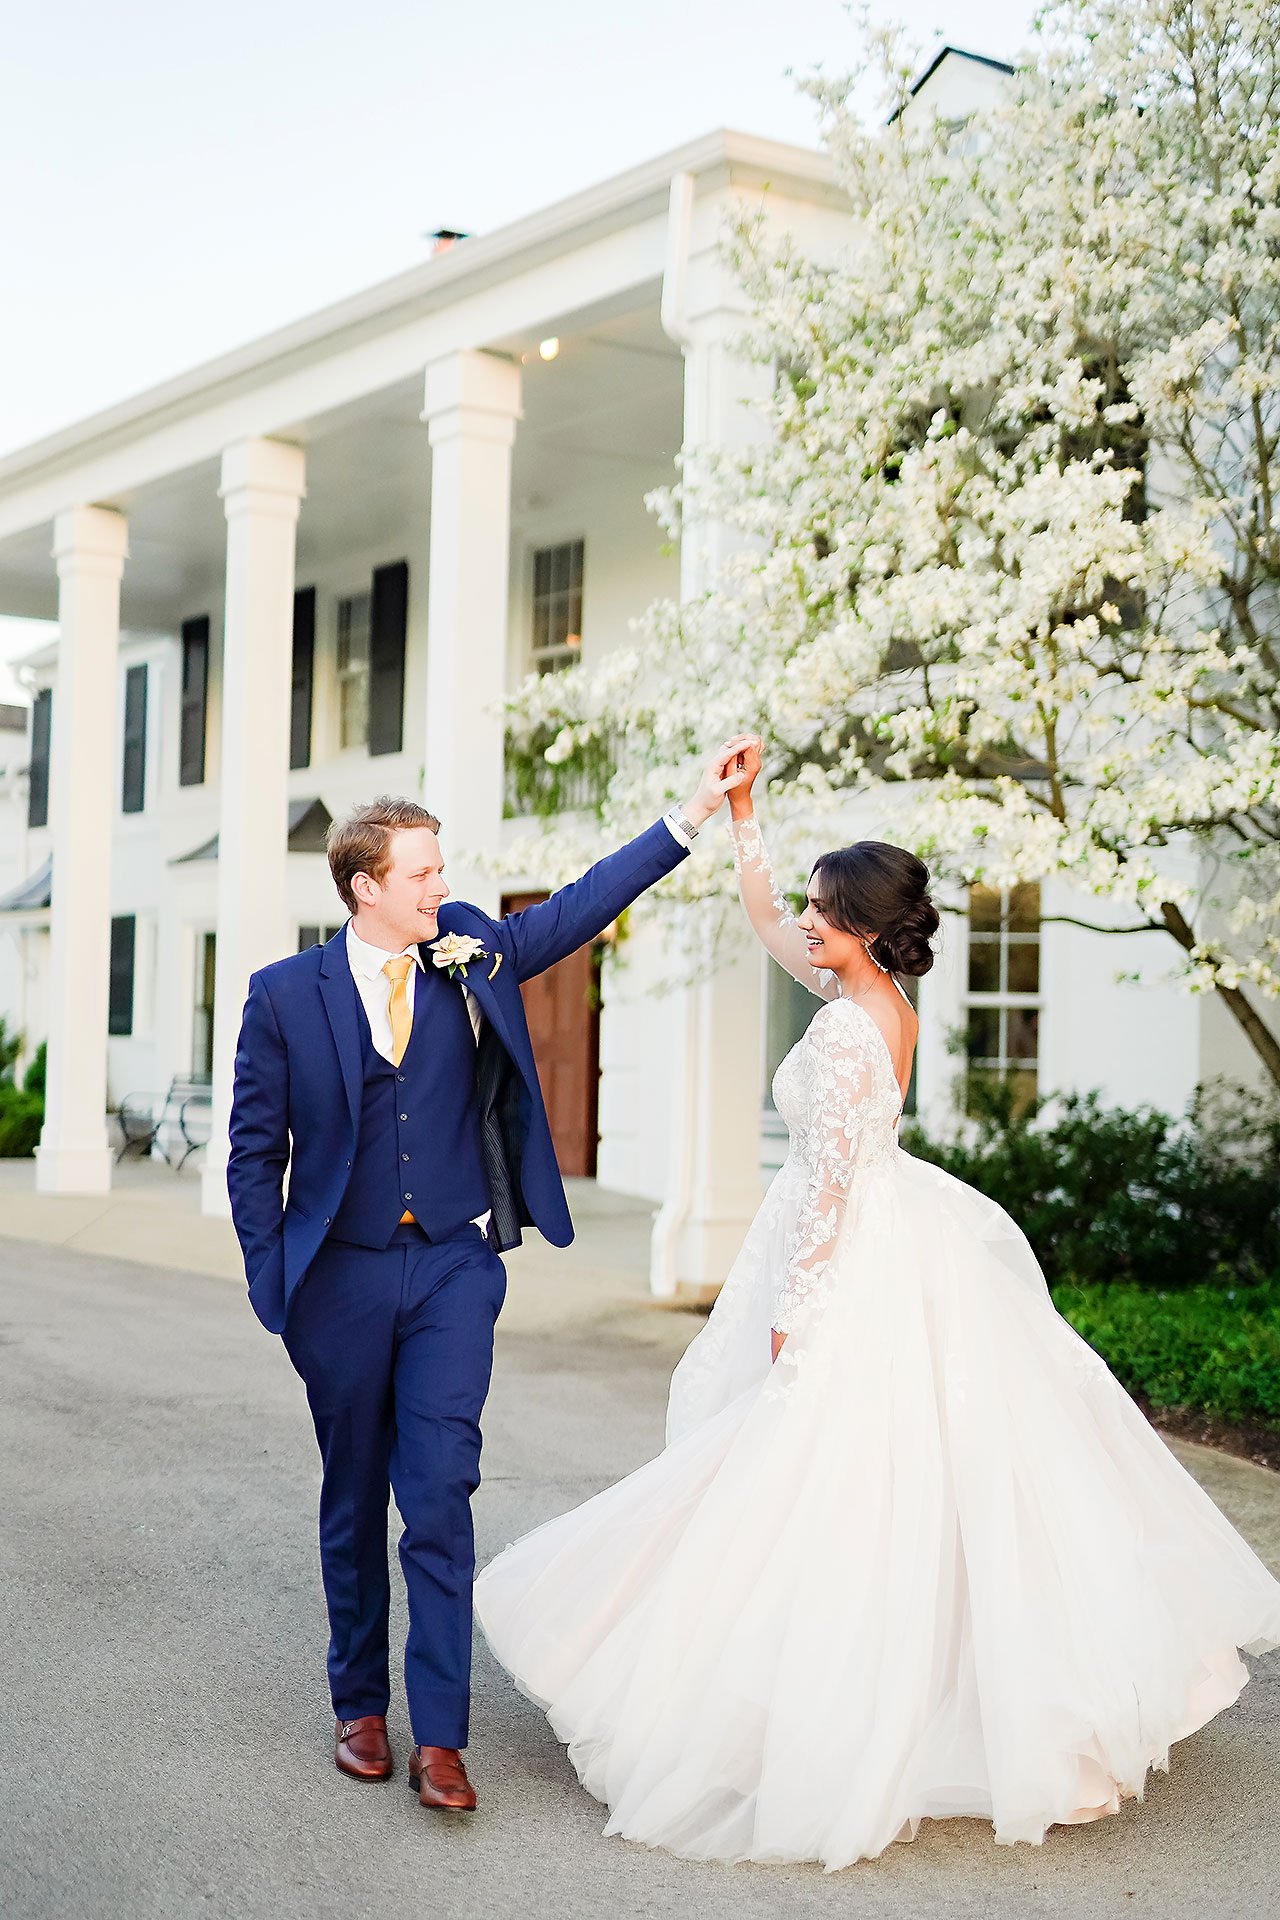 Nadia Parker Black Iris Estate Carmel Indiana Wedding May 2021 272